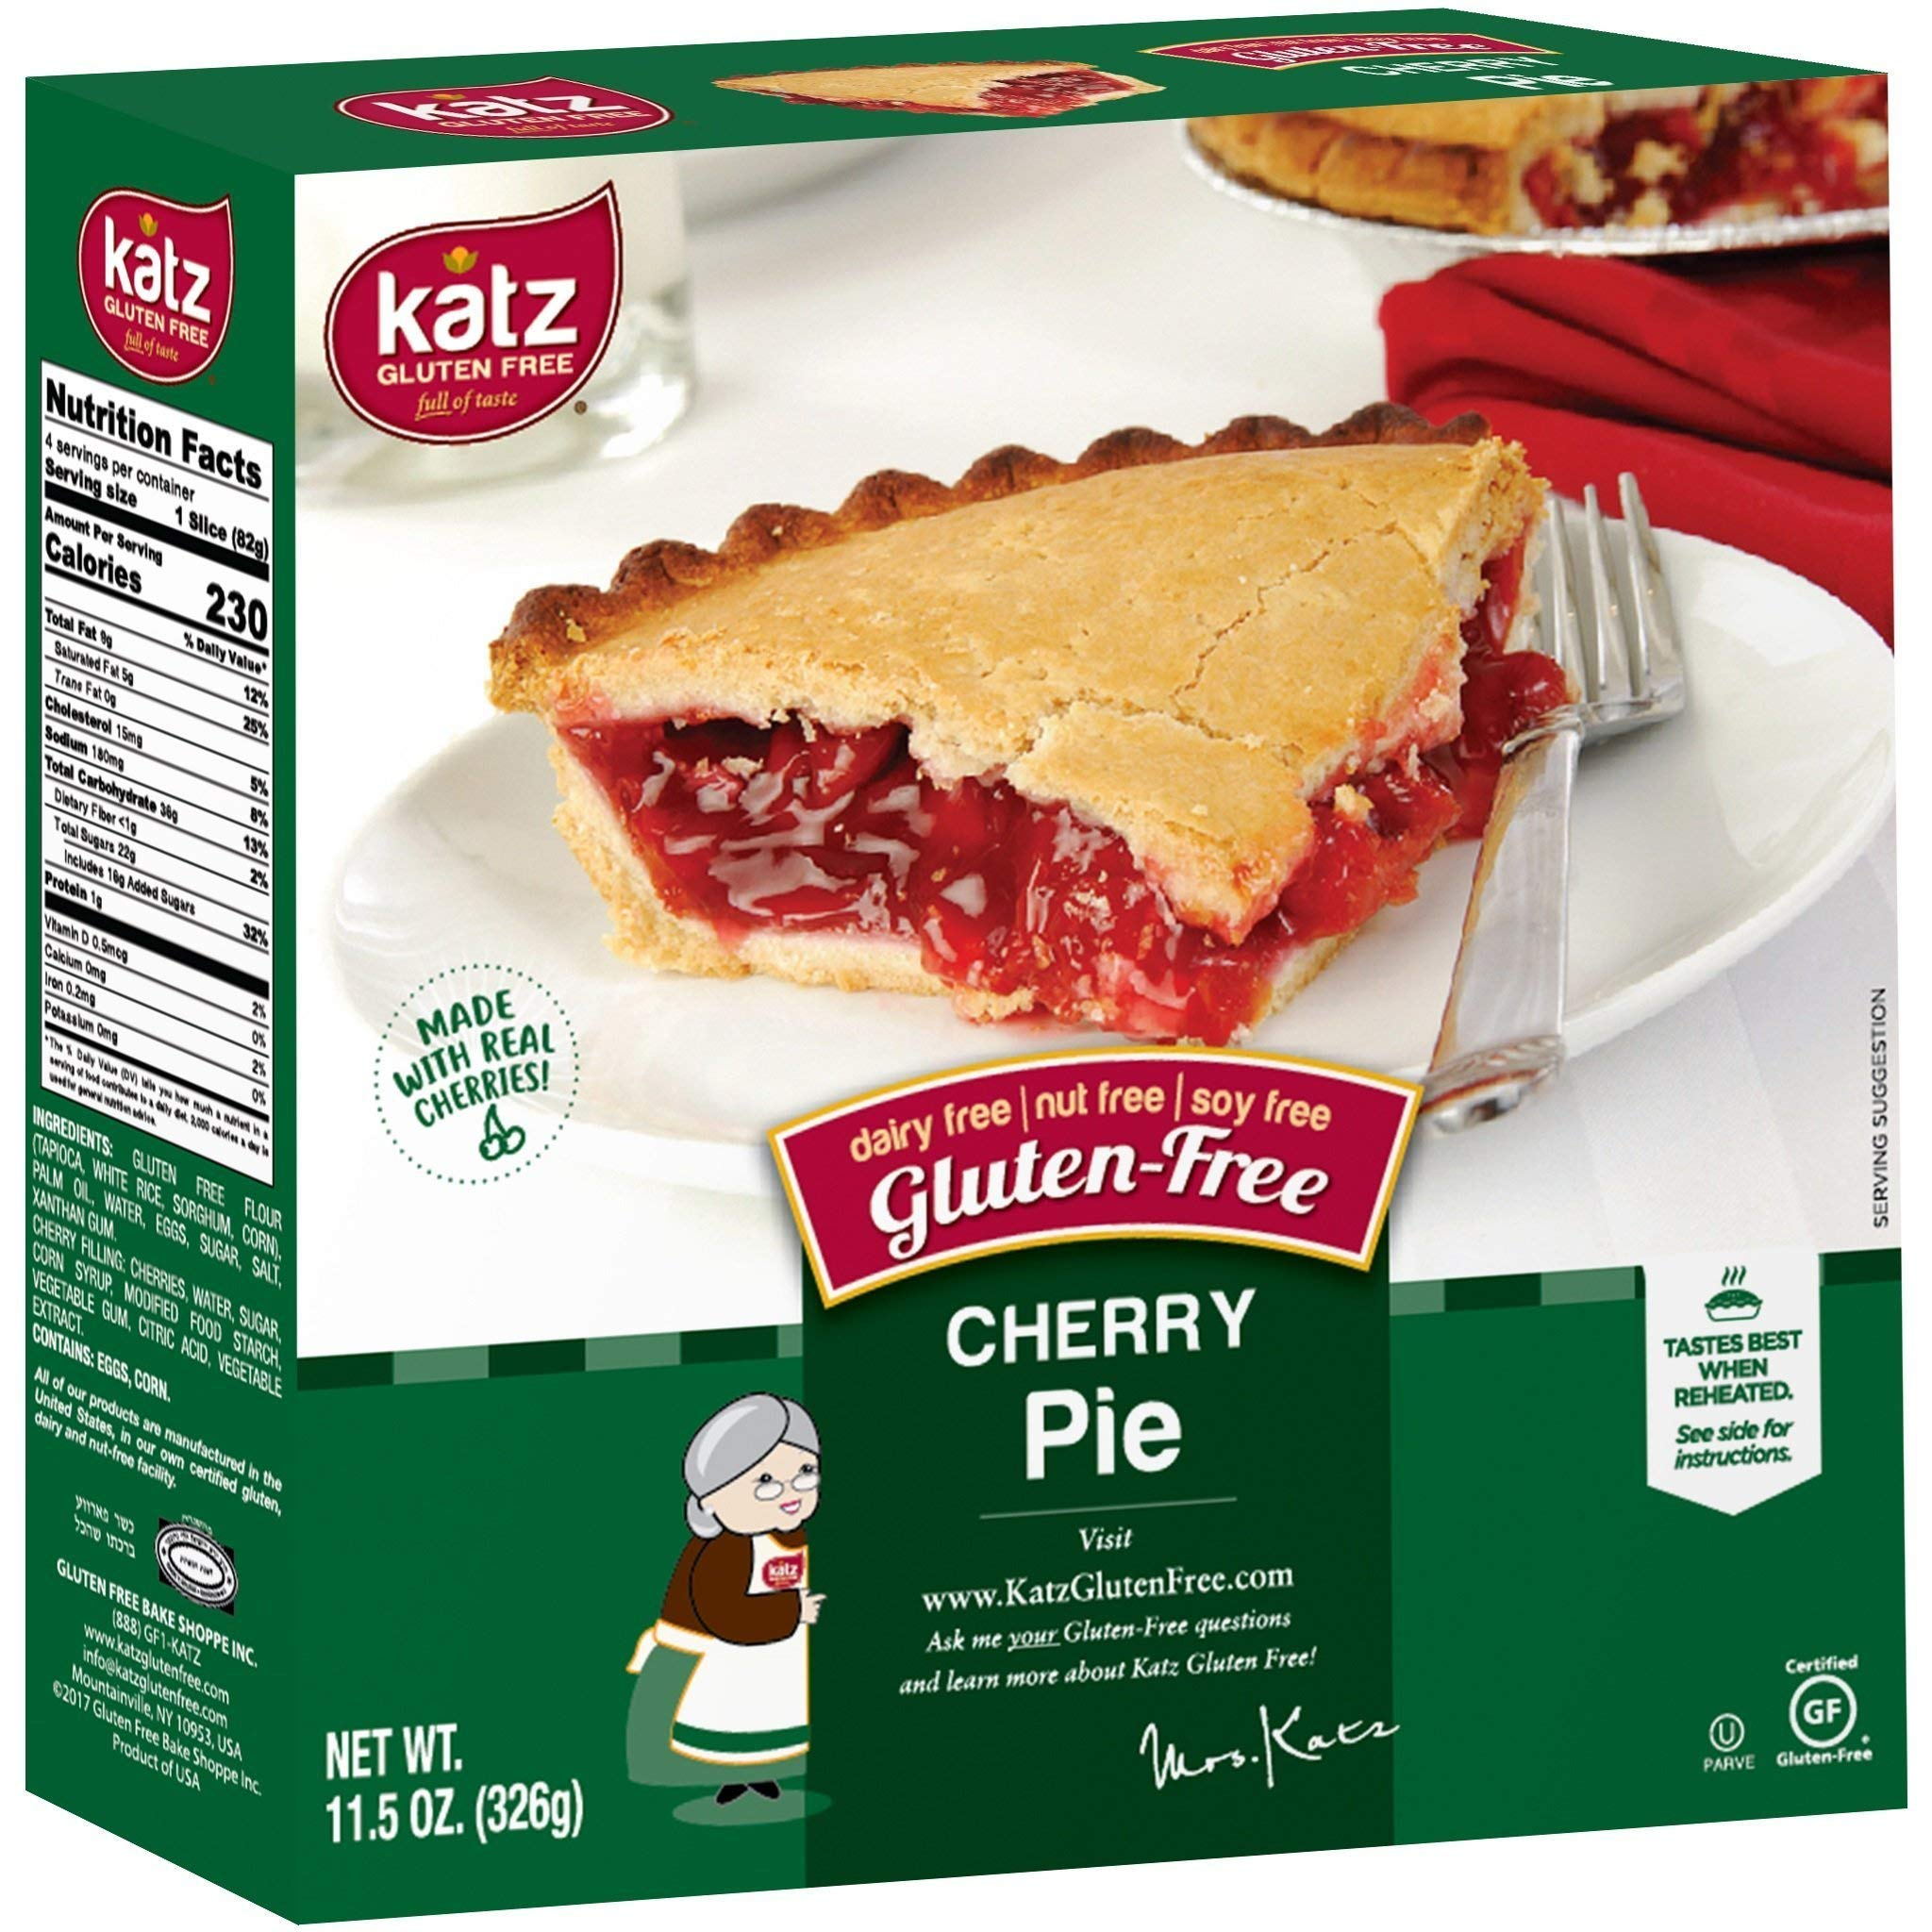 Katz Gluten Free Personal Size Cherry Pie   Dairy, Nut, Soy and Gluten Free   Kosher (6 Packs of 1 Pie, 11.5 Ounce Each) by Katz Gluten Free